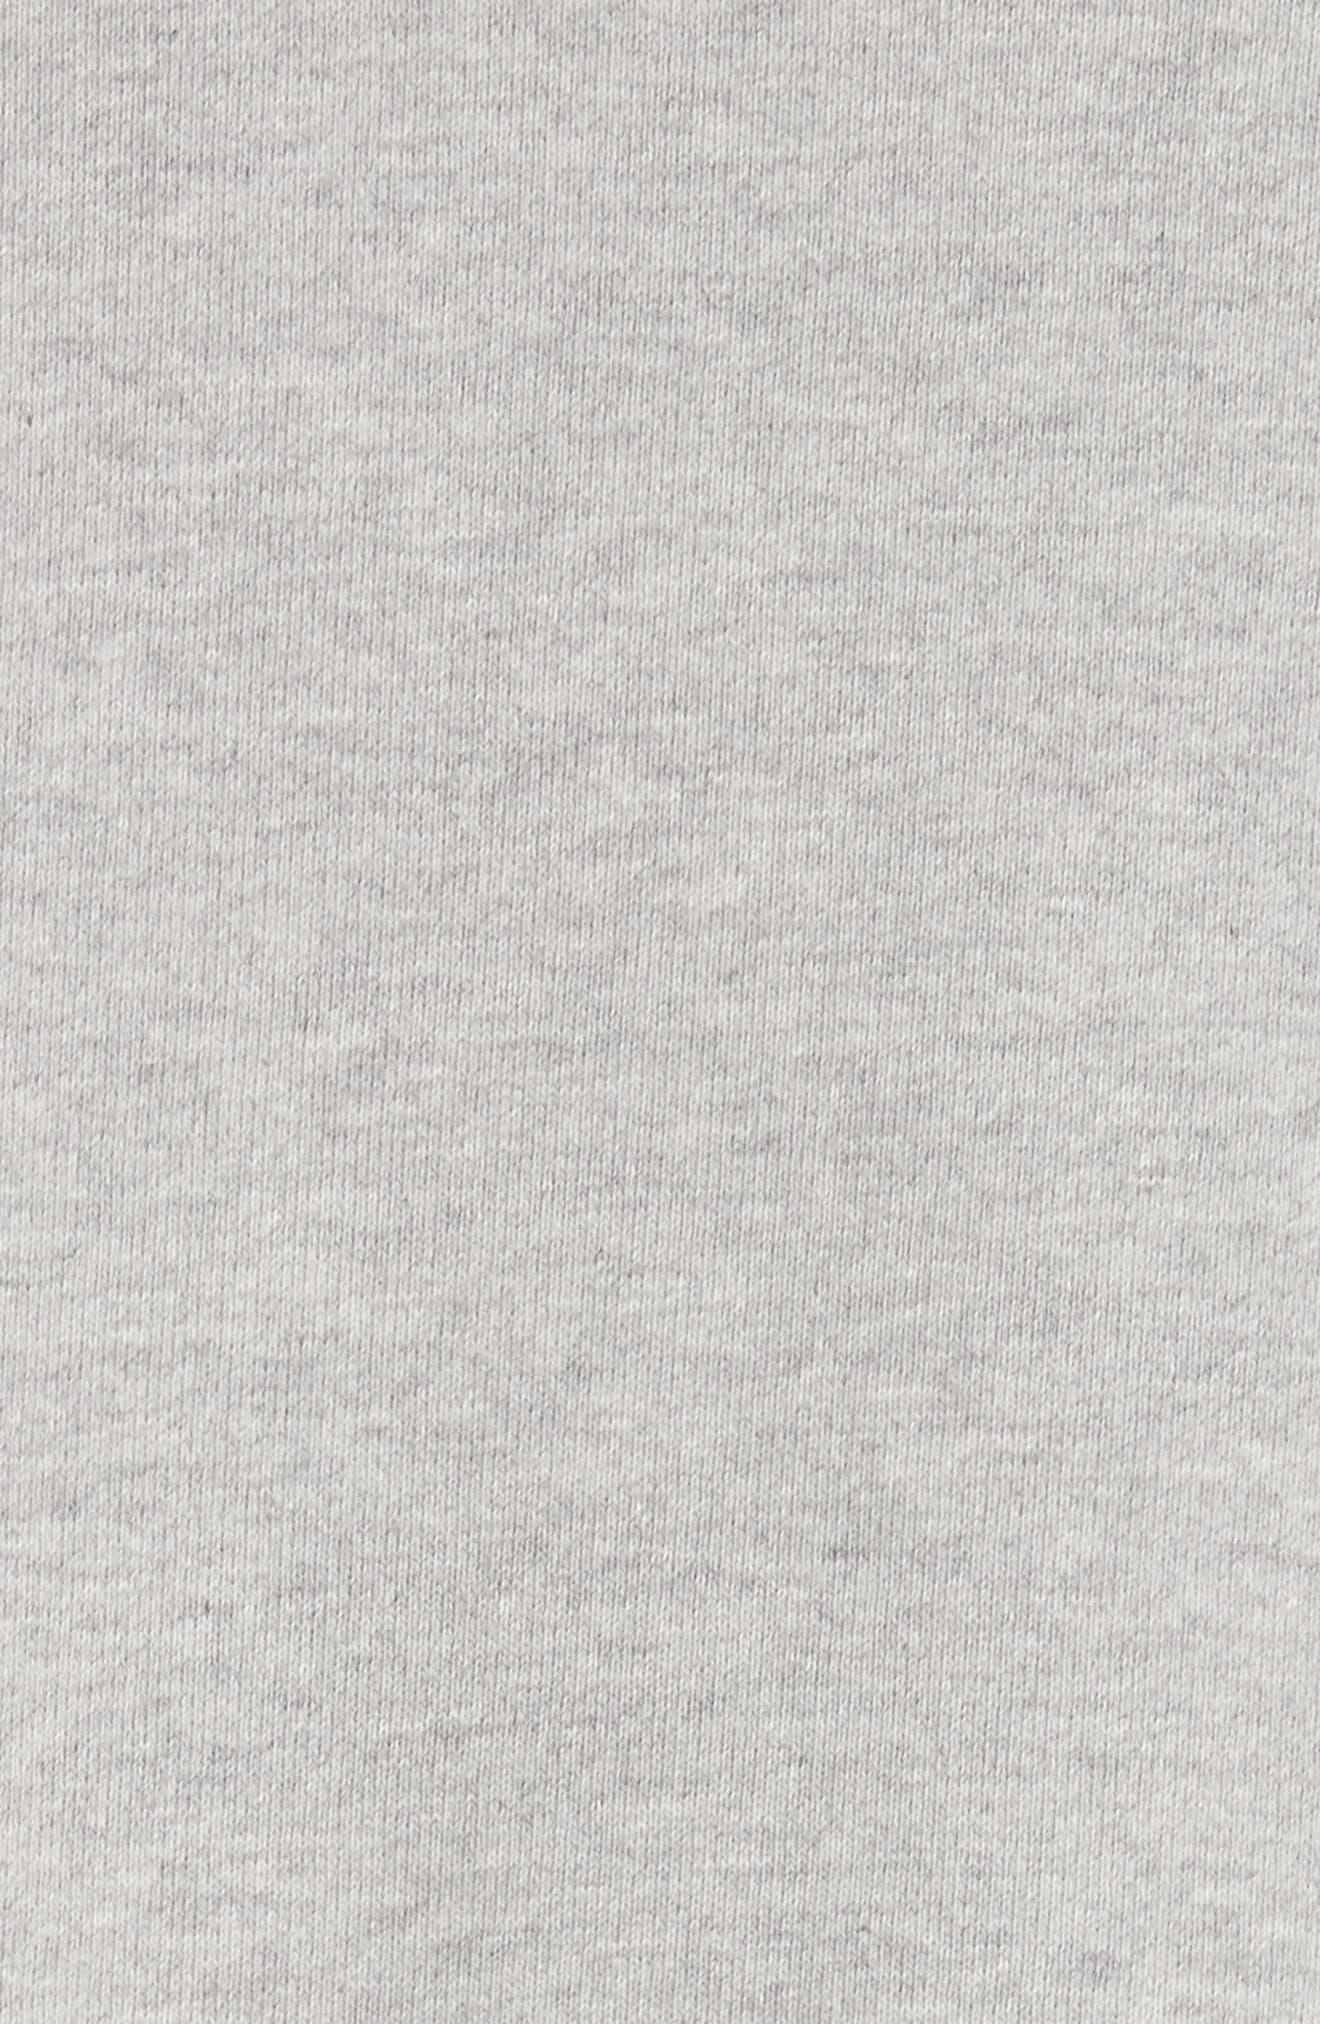 PSWL Graphic Jersey Oversize Sweatshirt,                             Alternate thumbnail 6, color,                             082